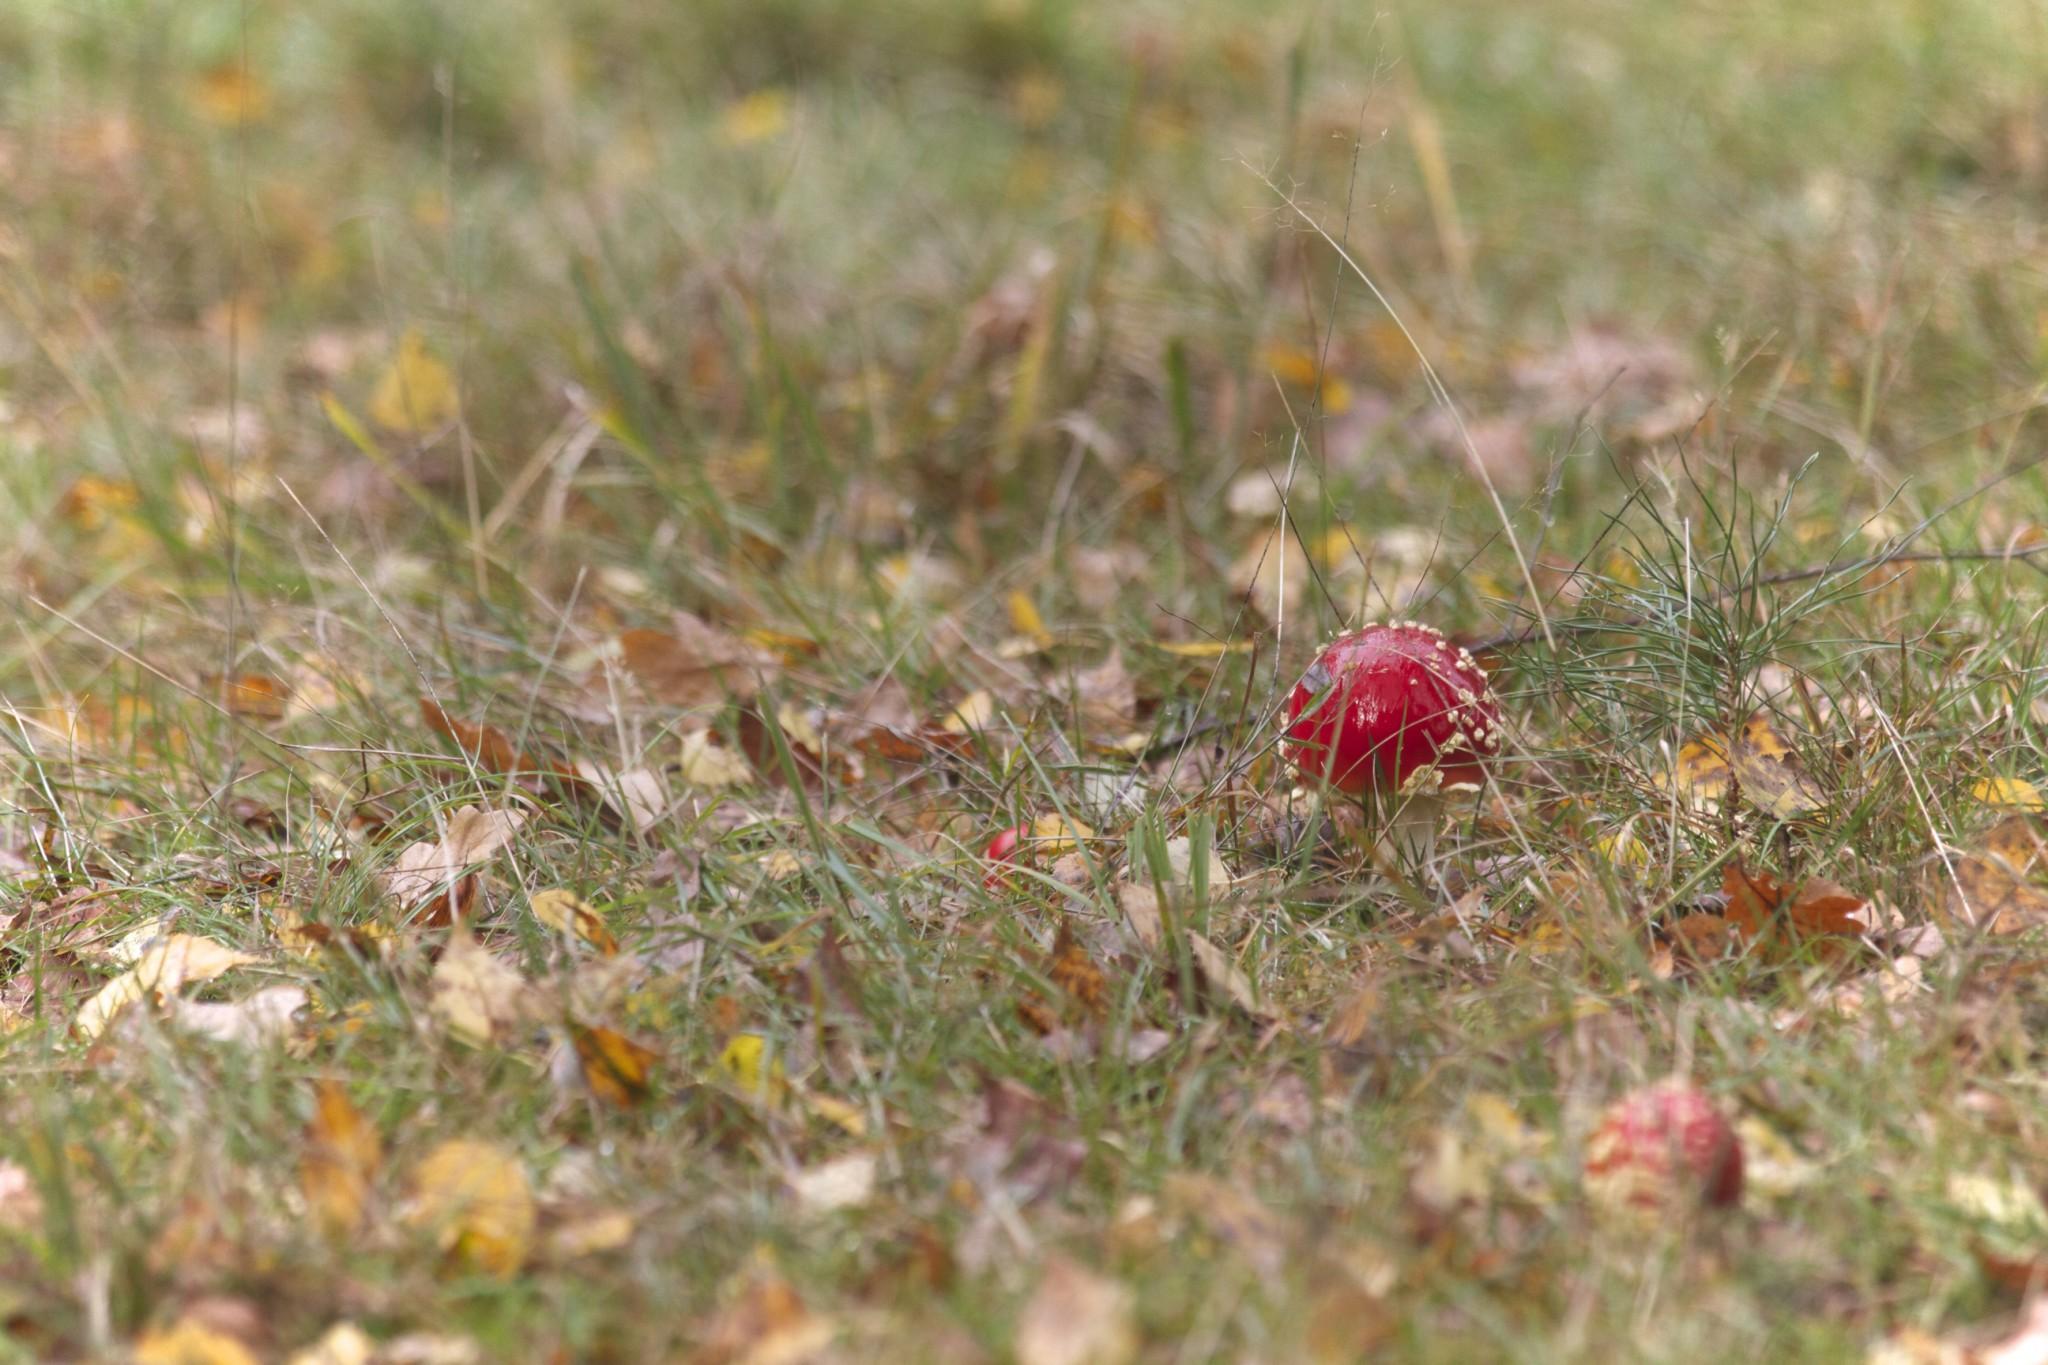 Taking wonderful nature closeups using a telephoto lens